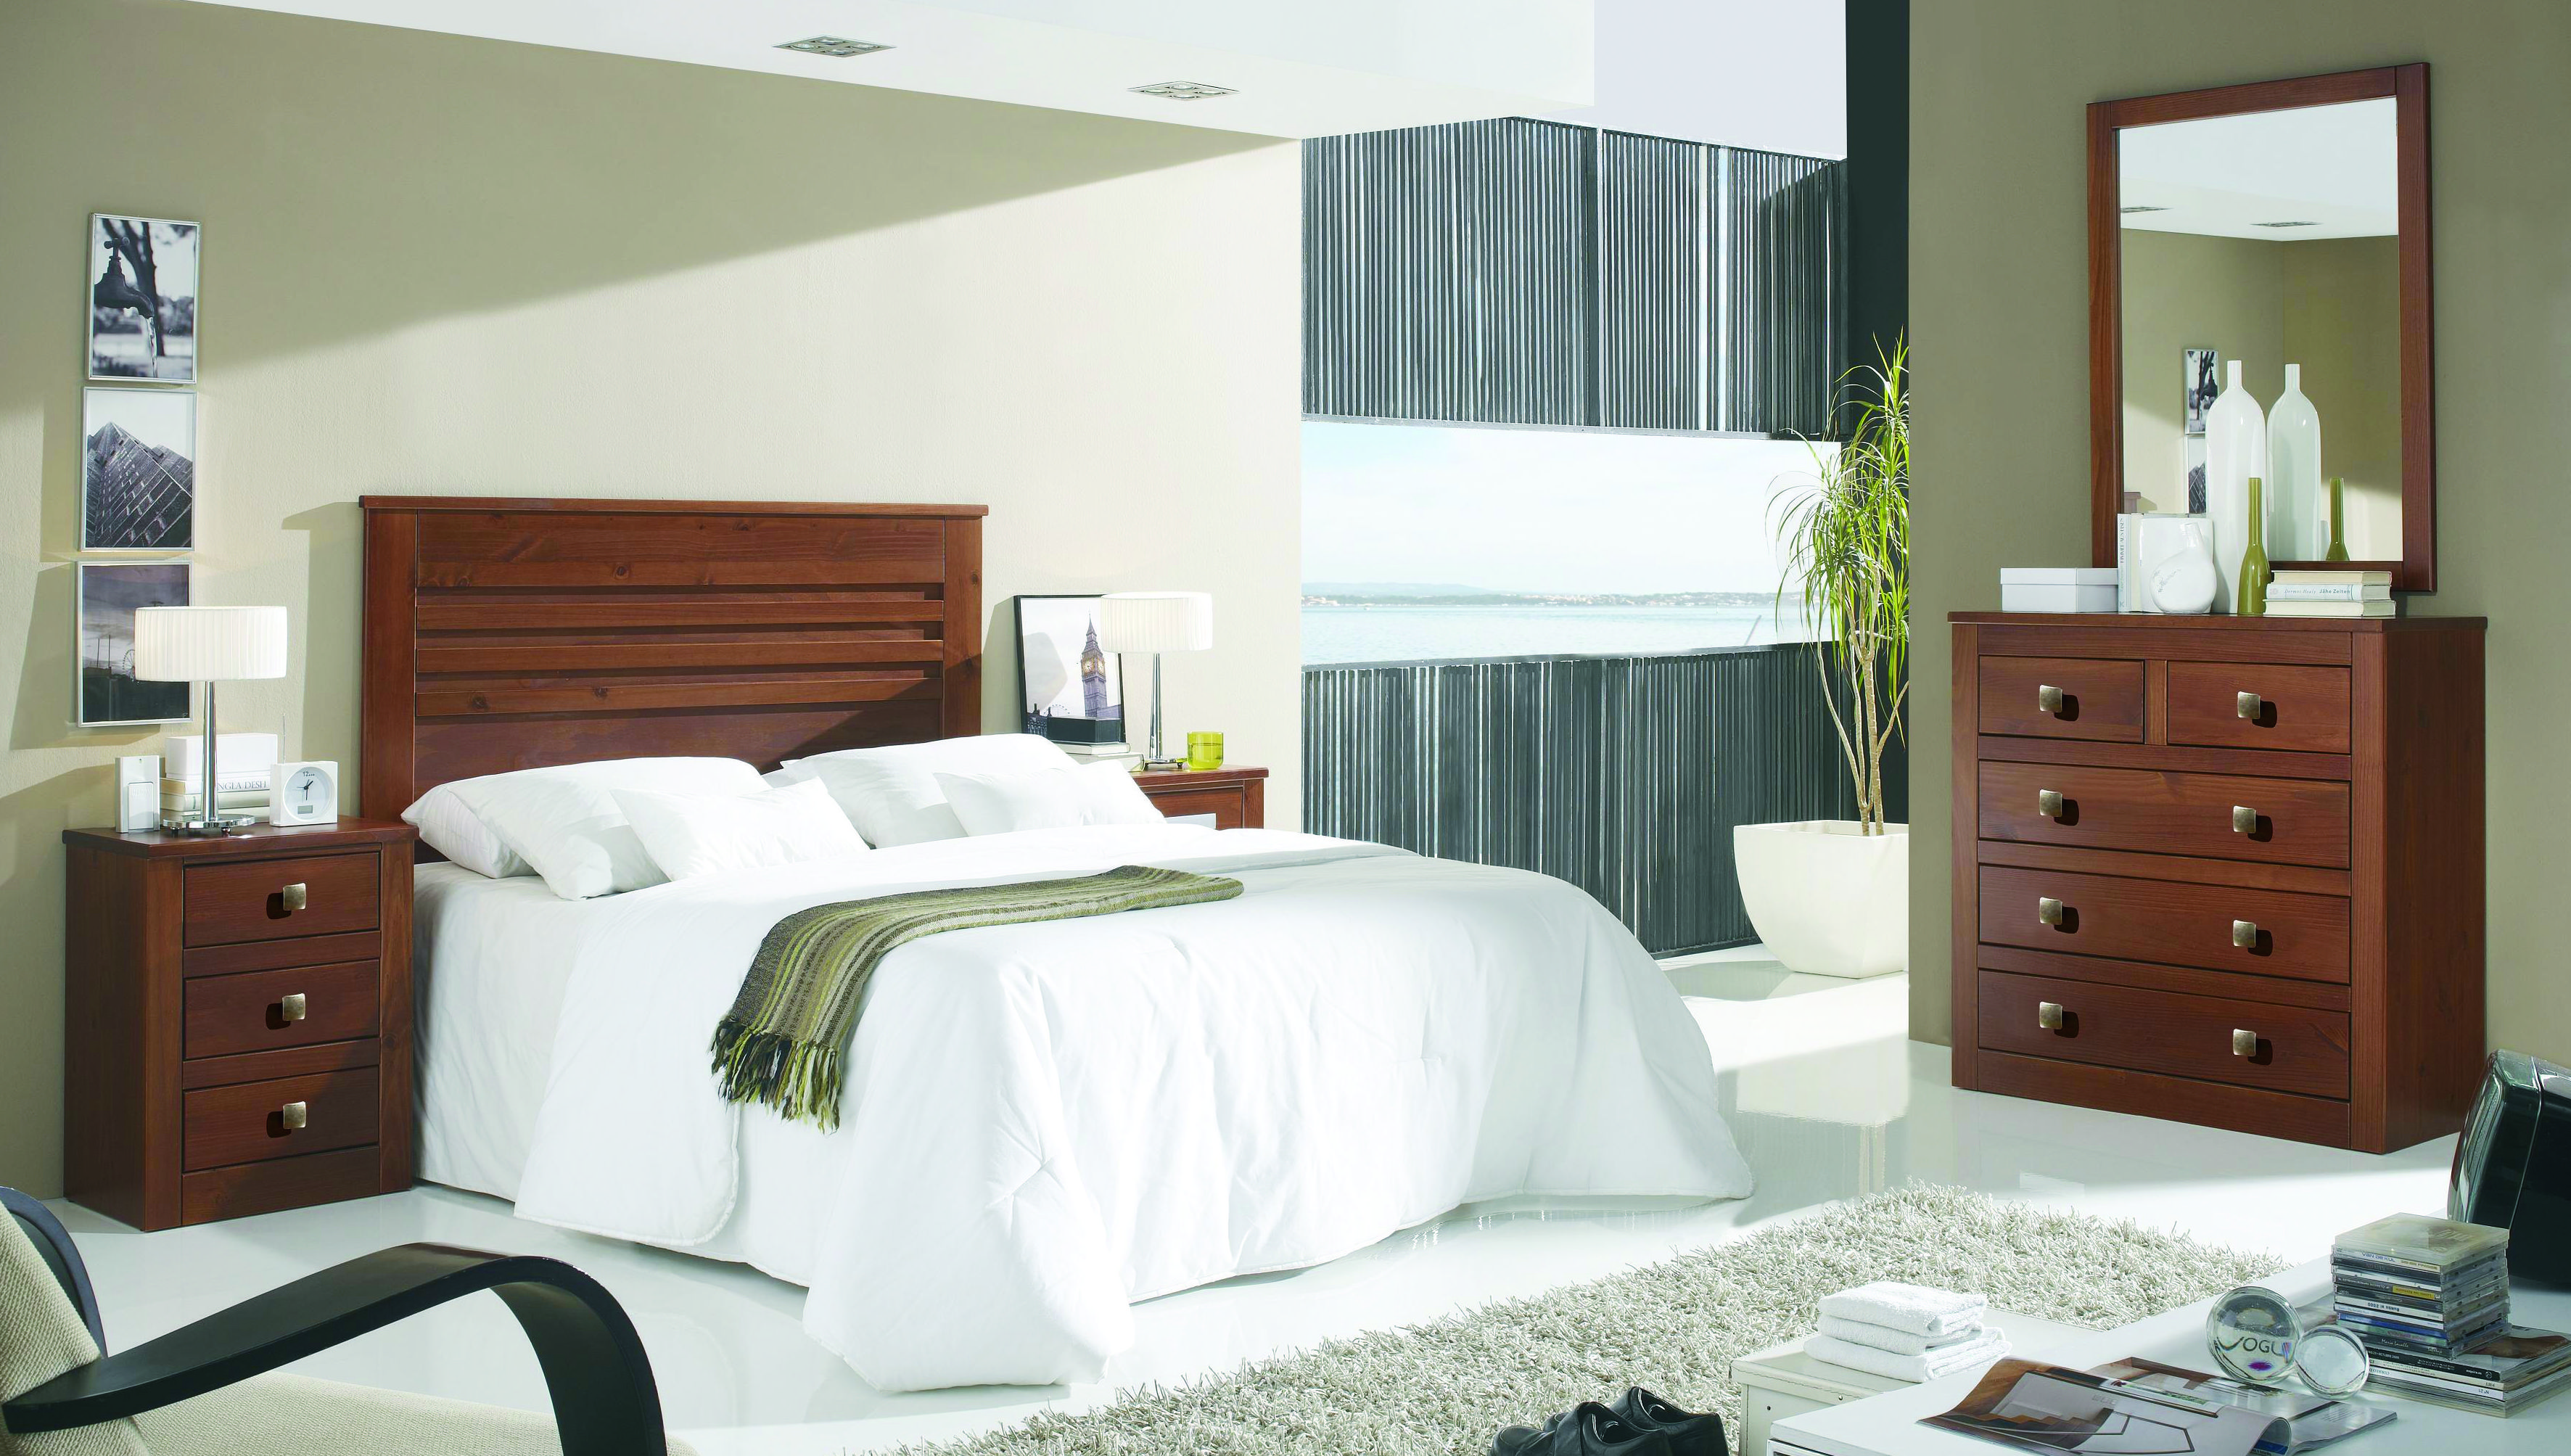 02 dormitorio matrimonio catalogo de muebles san francisco for Catalogo muebles dormitorio